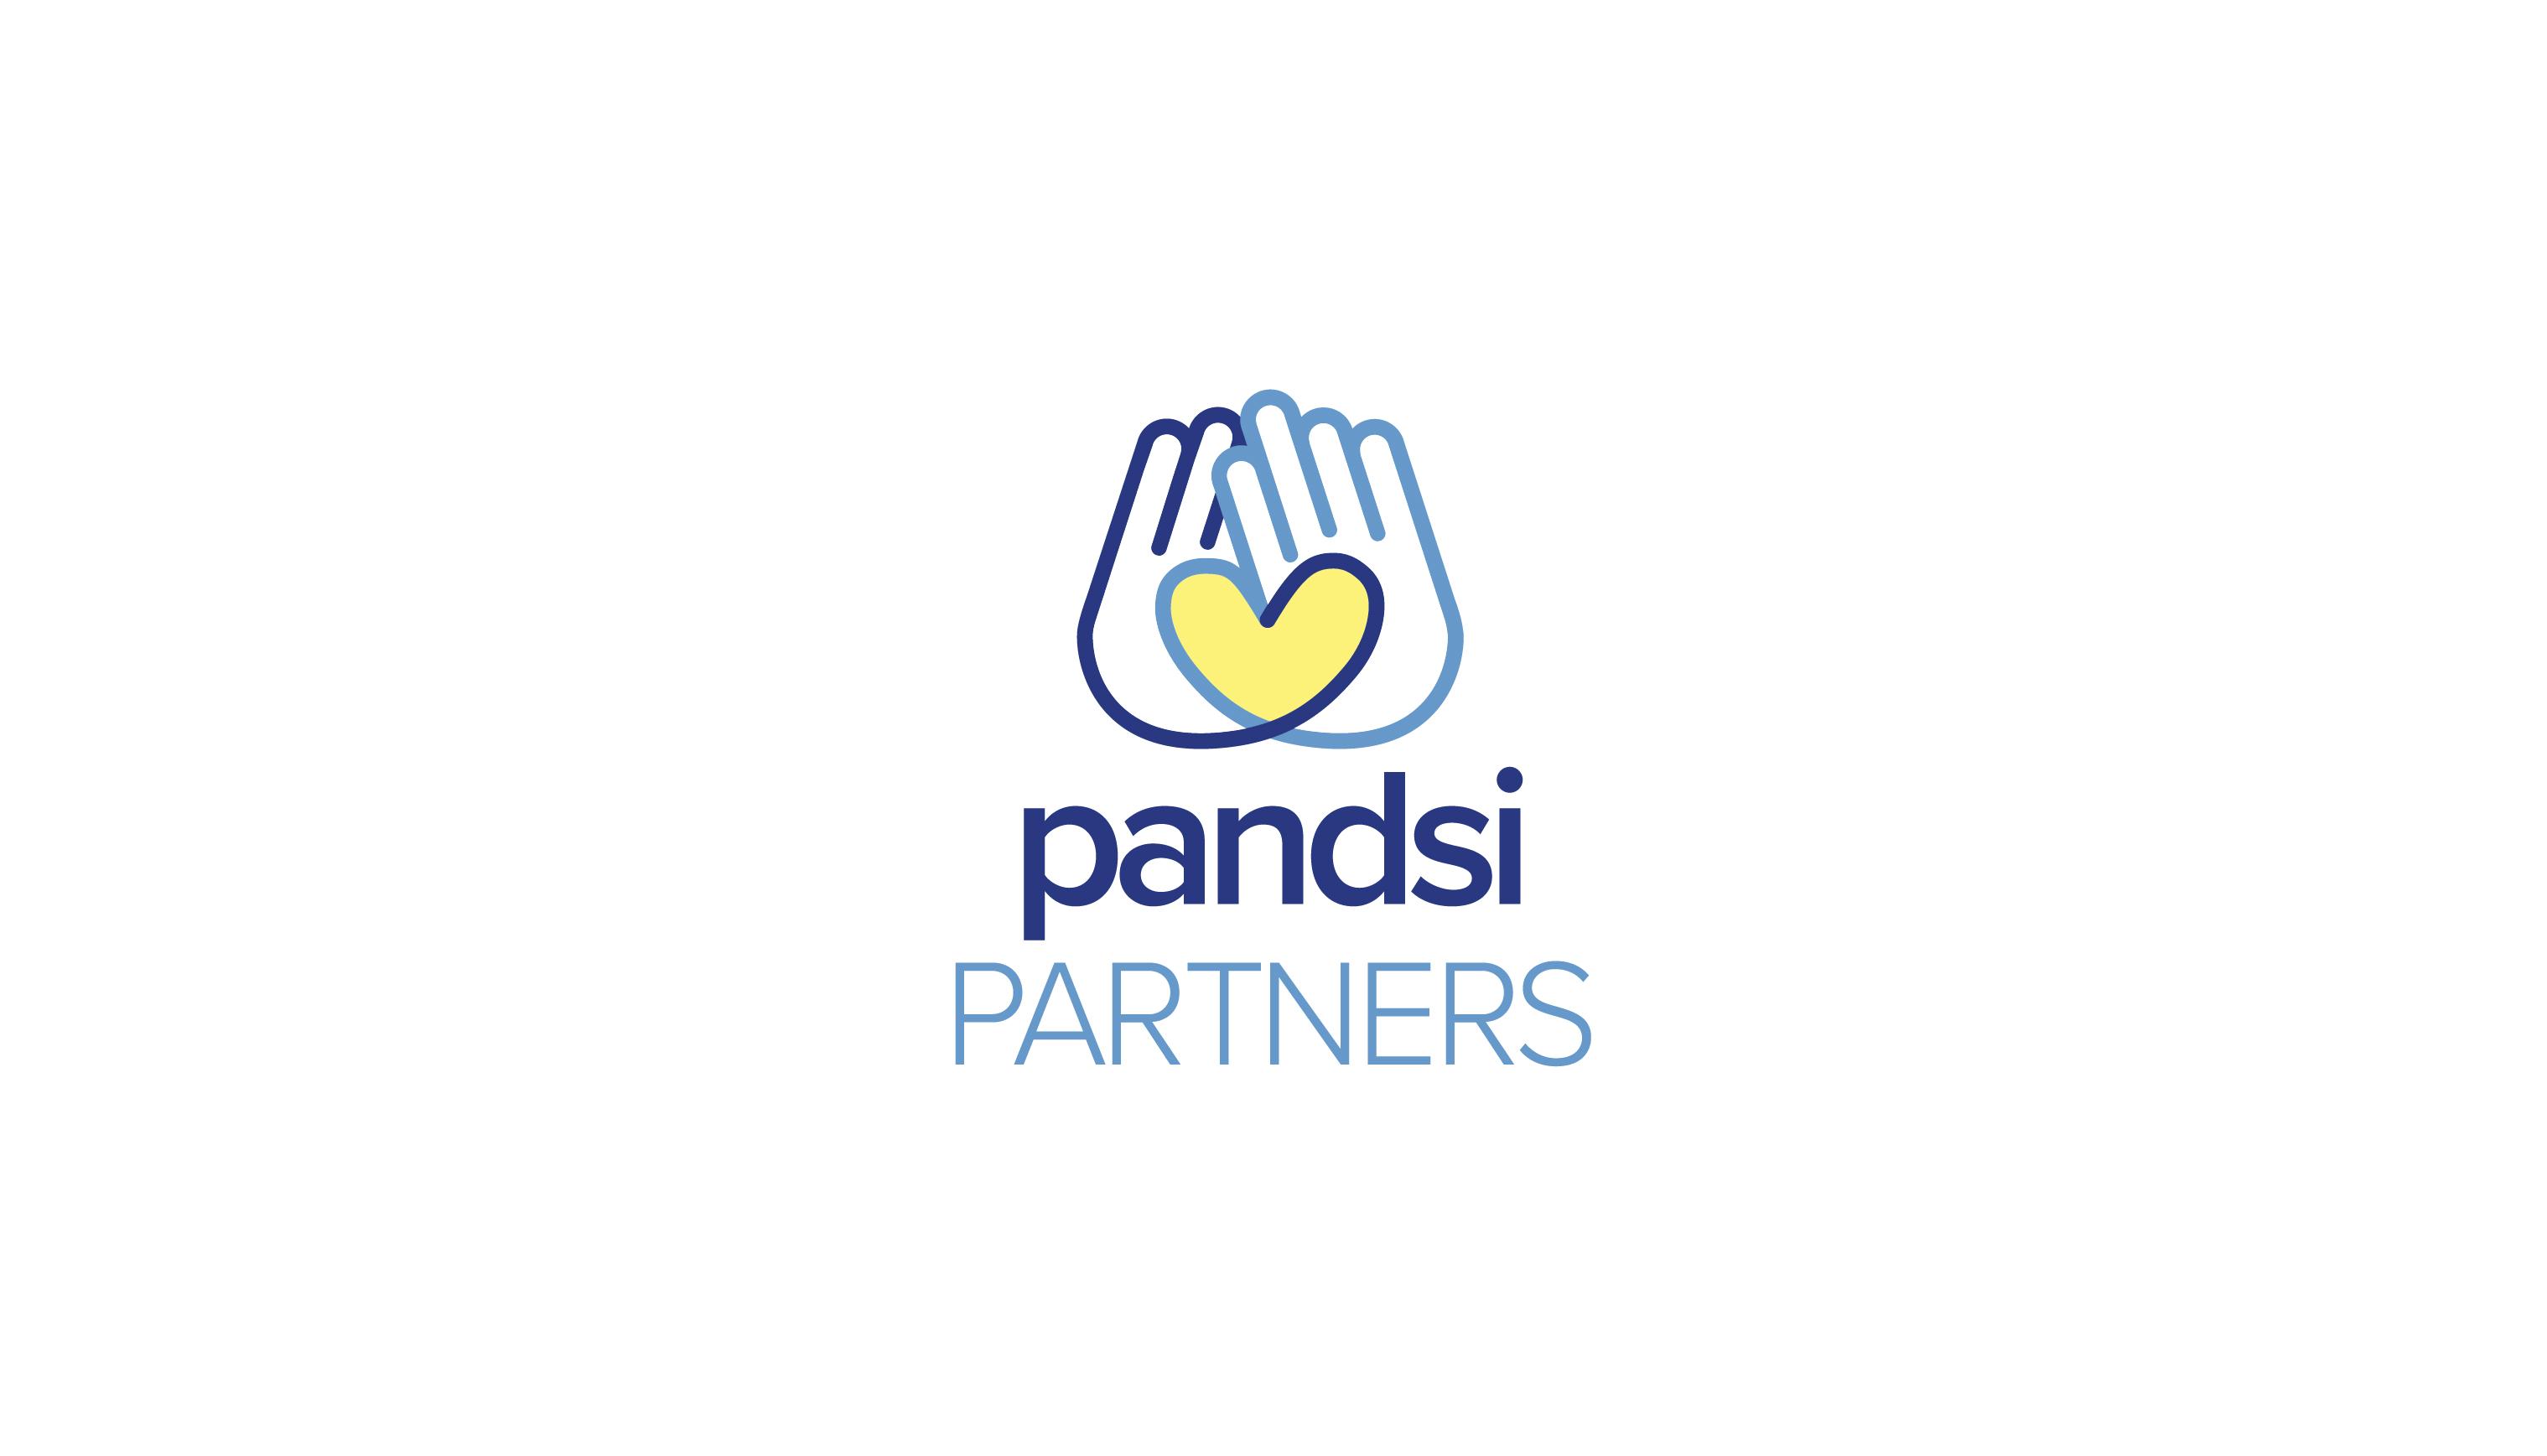 PandsiPartnersstacked